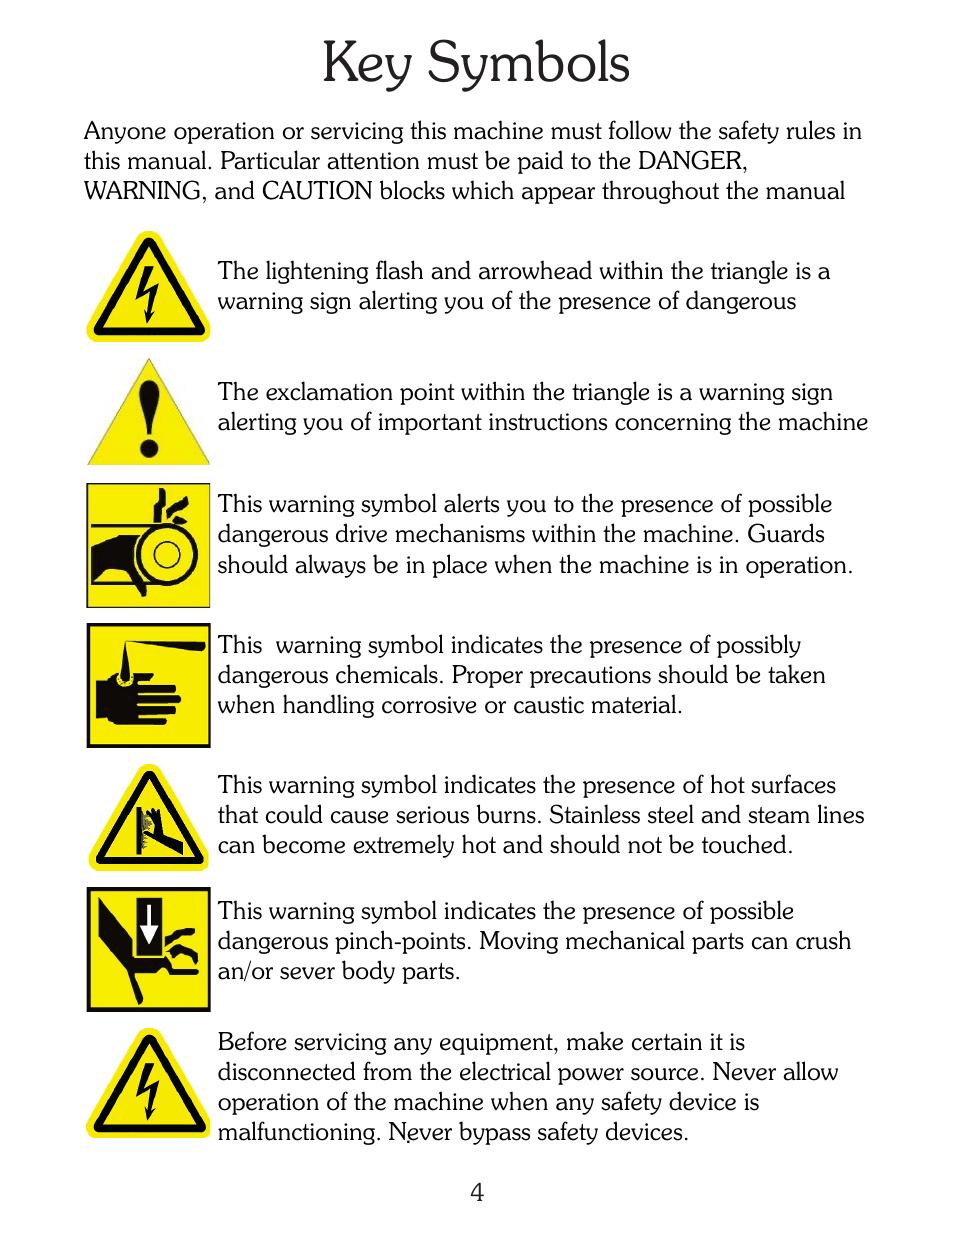 Key symbols | B&C Technologies A-Computer Programming (HE